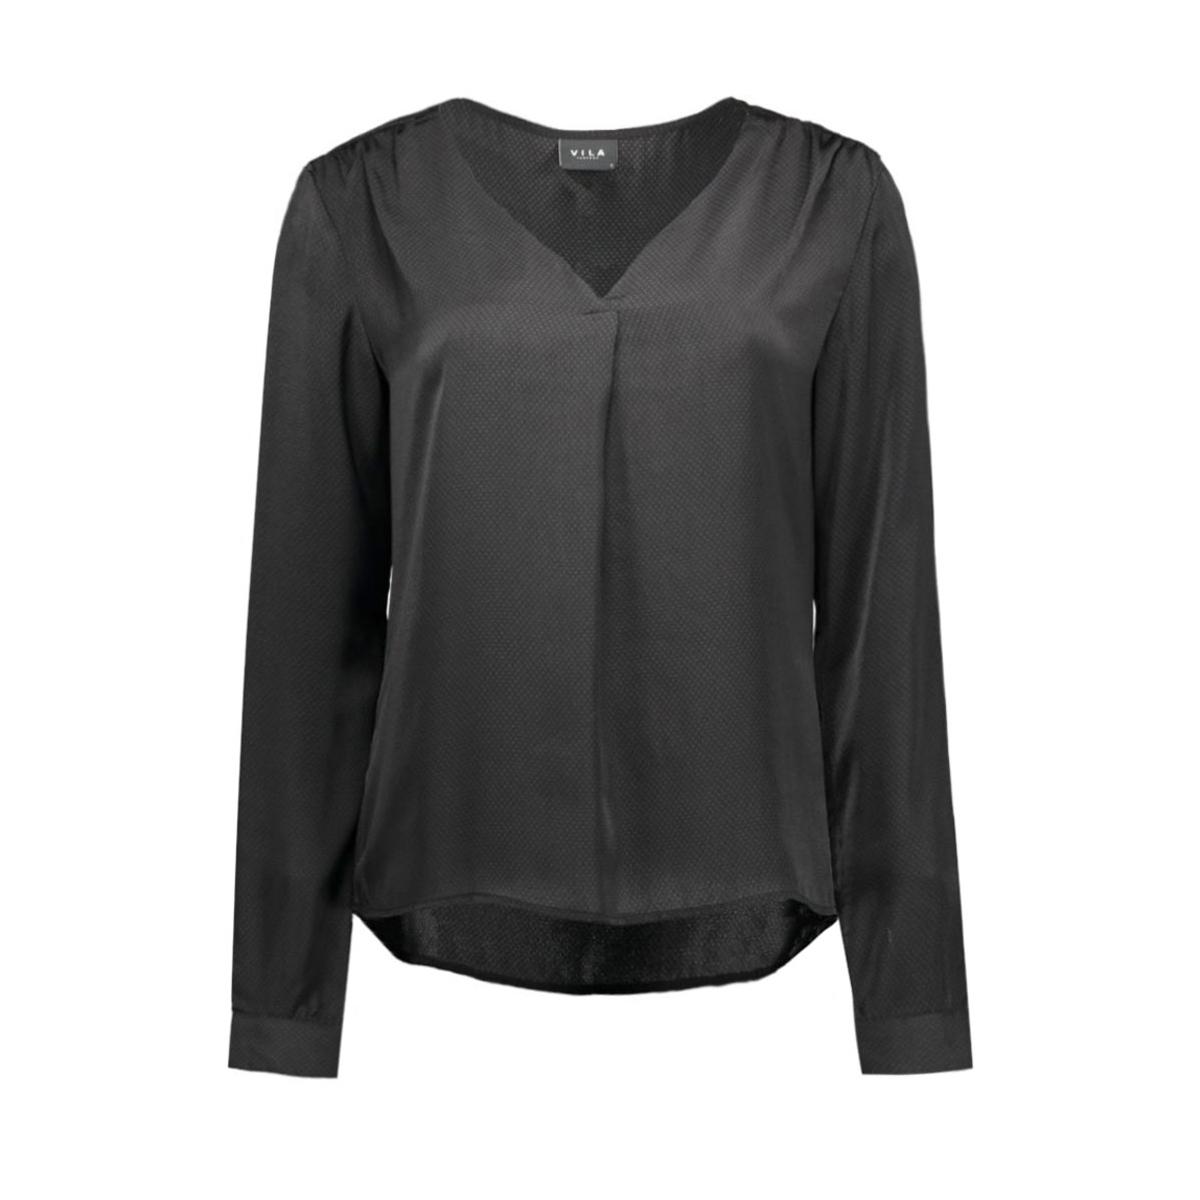 vimelli l/s new top-noos 14036767 vila blouse black/dots